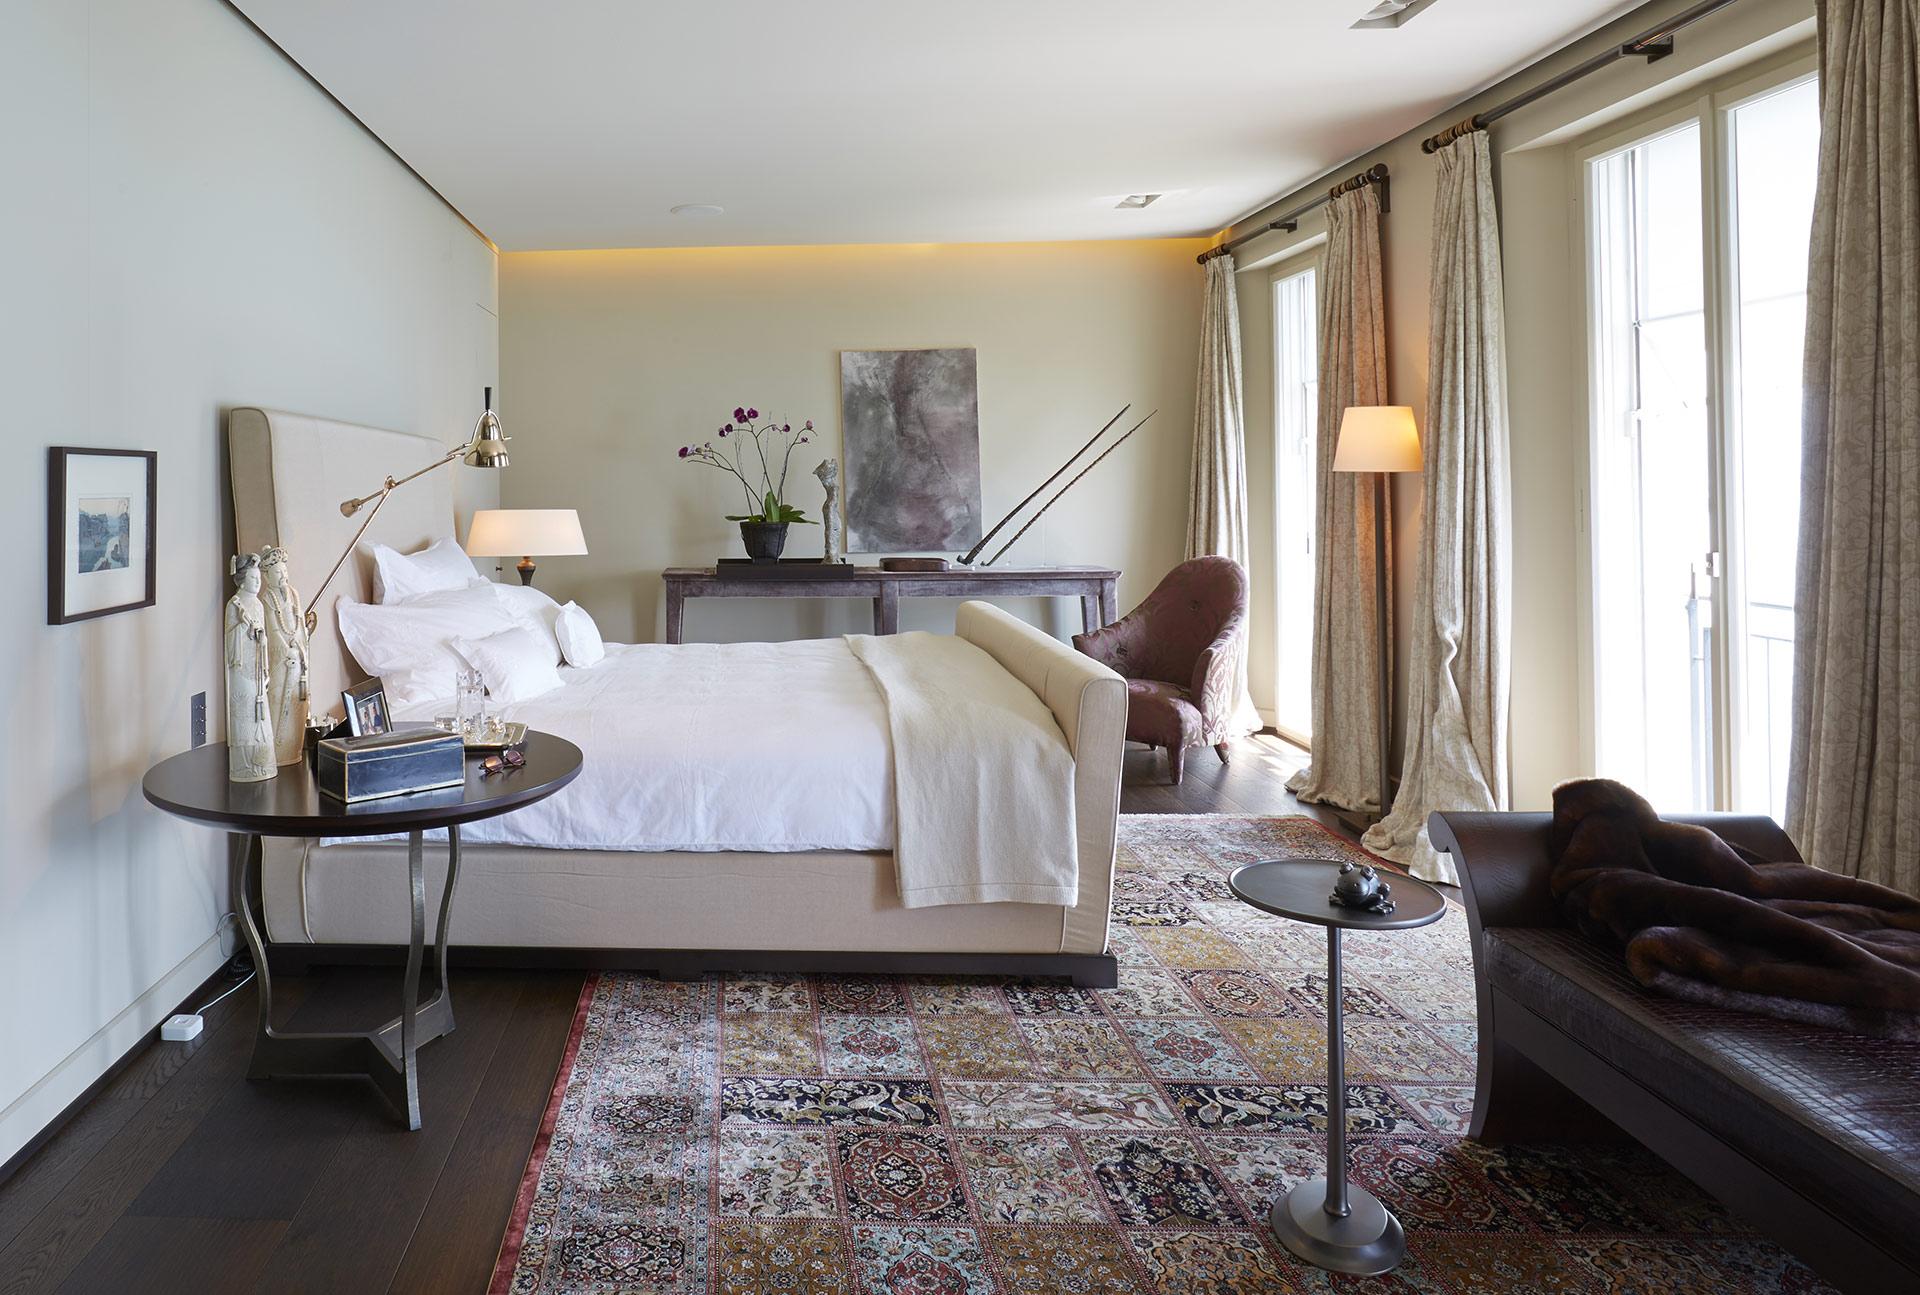 Bedroom in a private residence in Locarno, Switzerland furnished with Promemoria | Promemoria